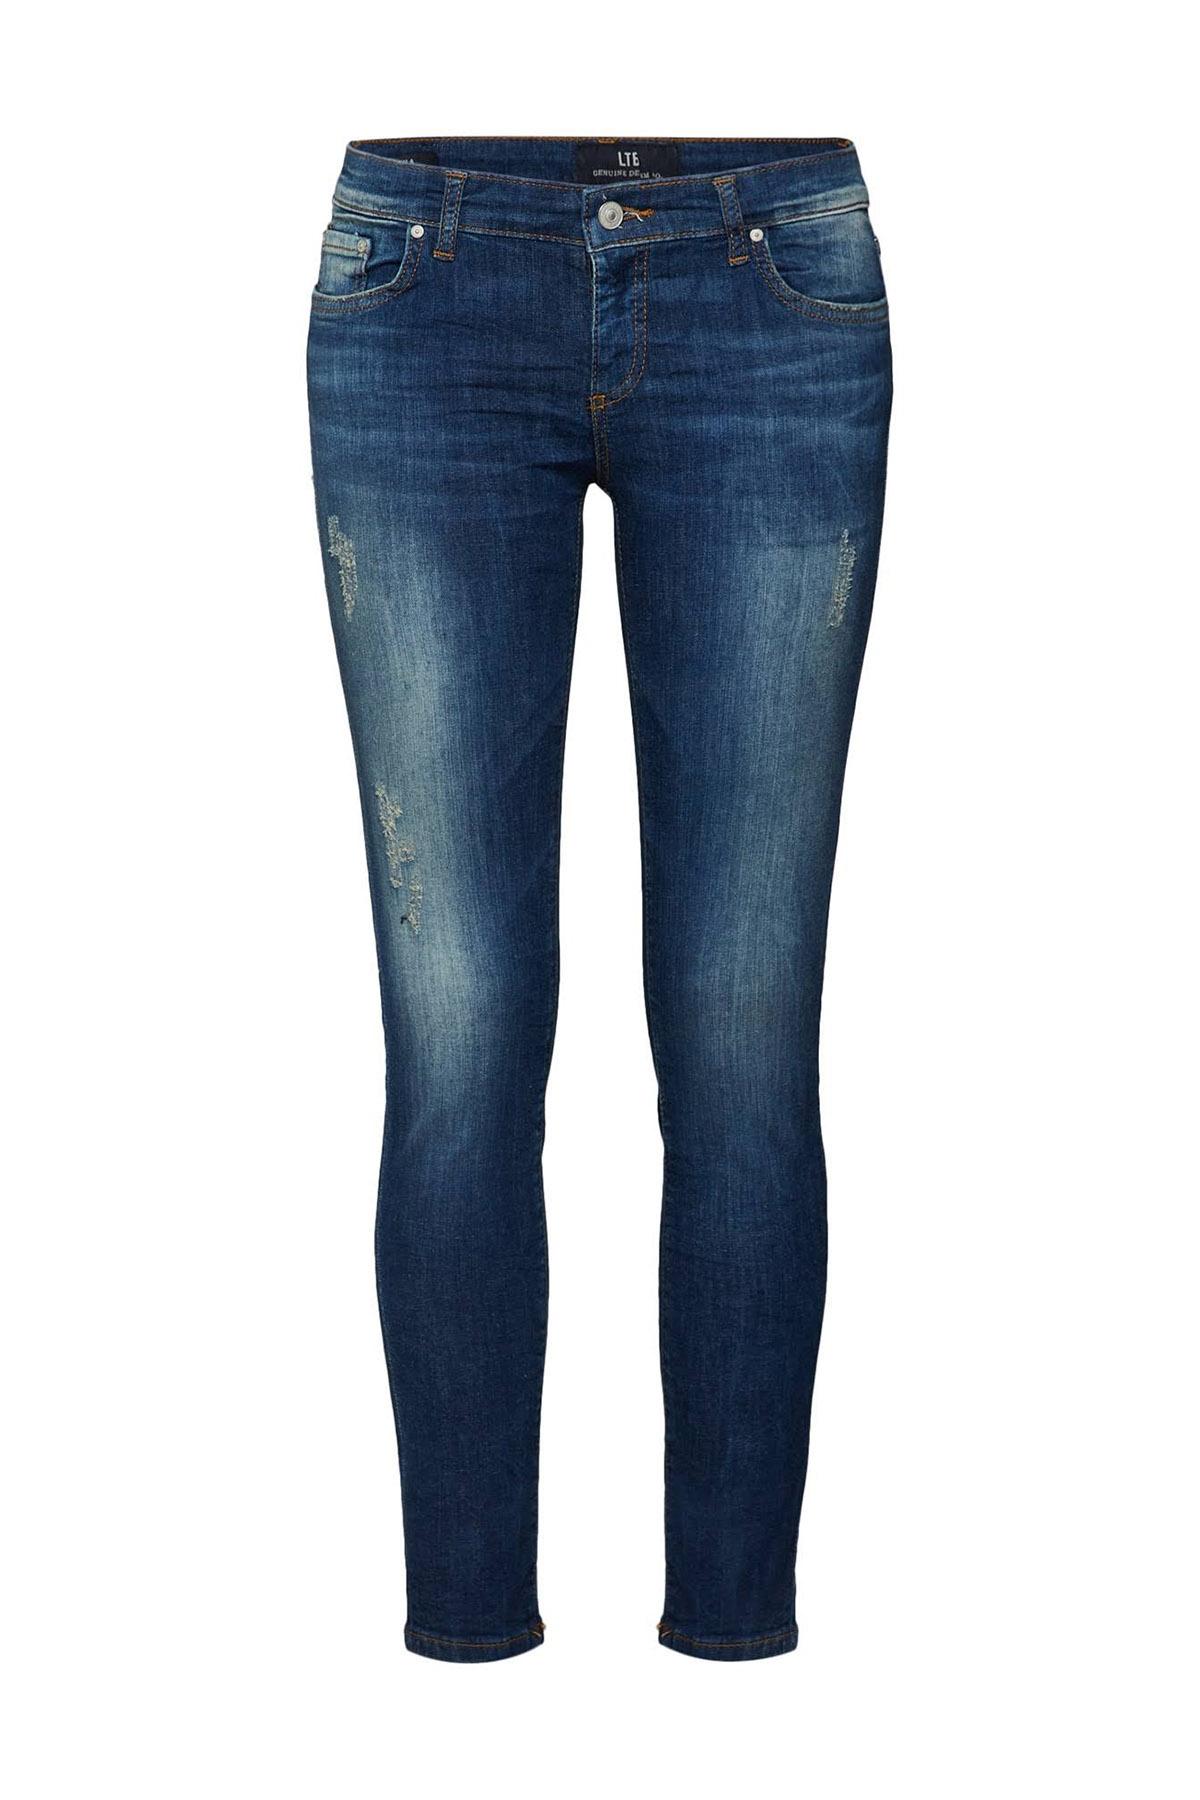 "Knöchellange Skinny Jeans ""Mina"" Fiona Wash"